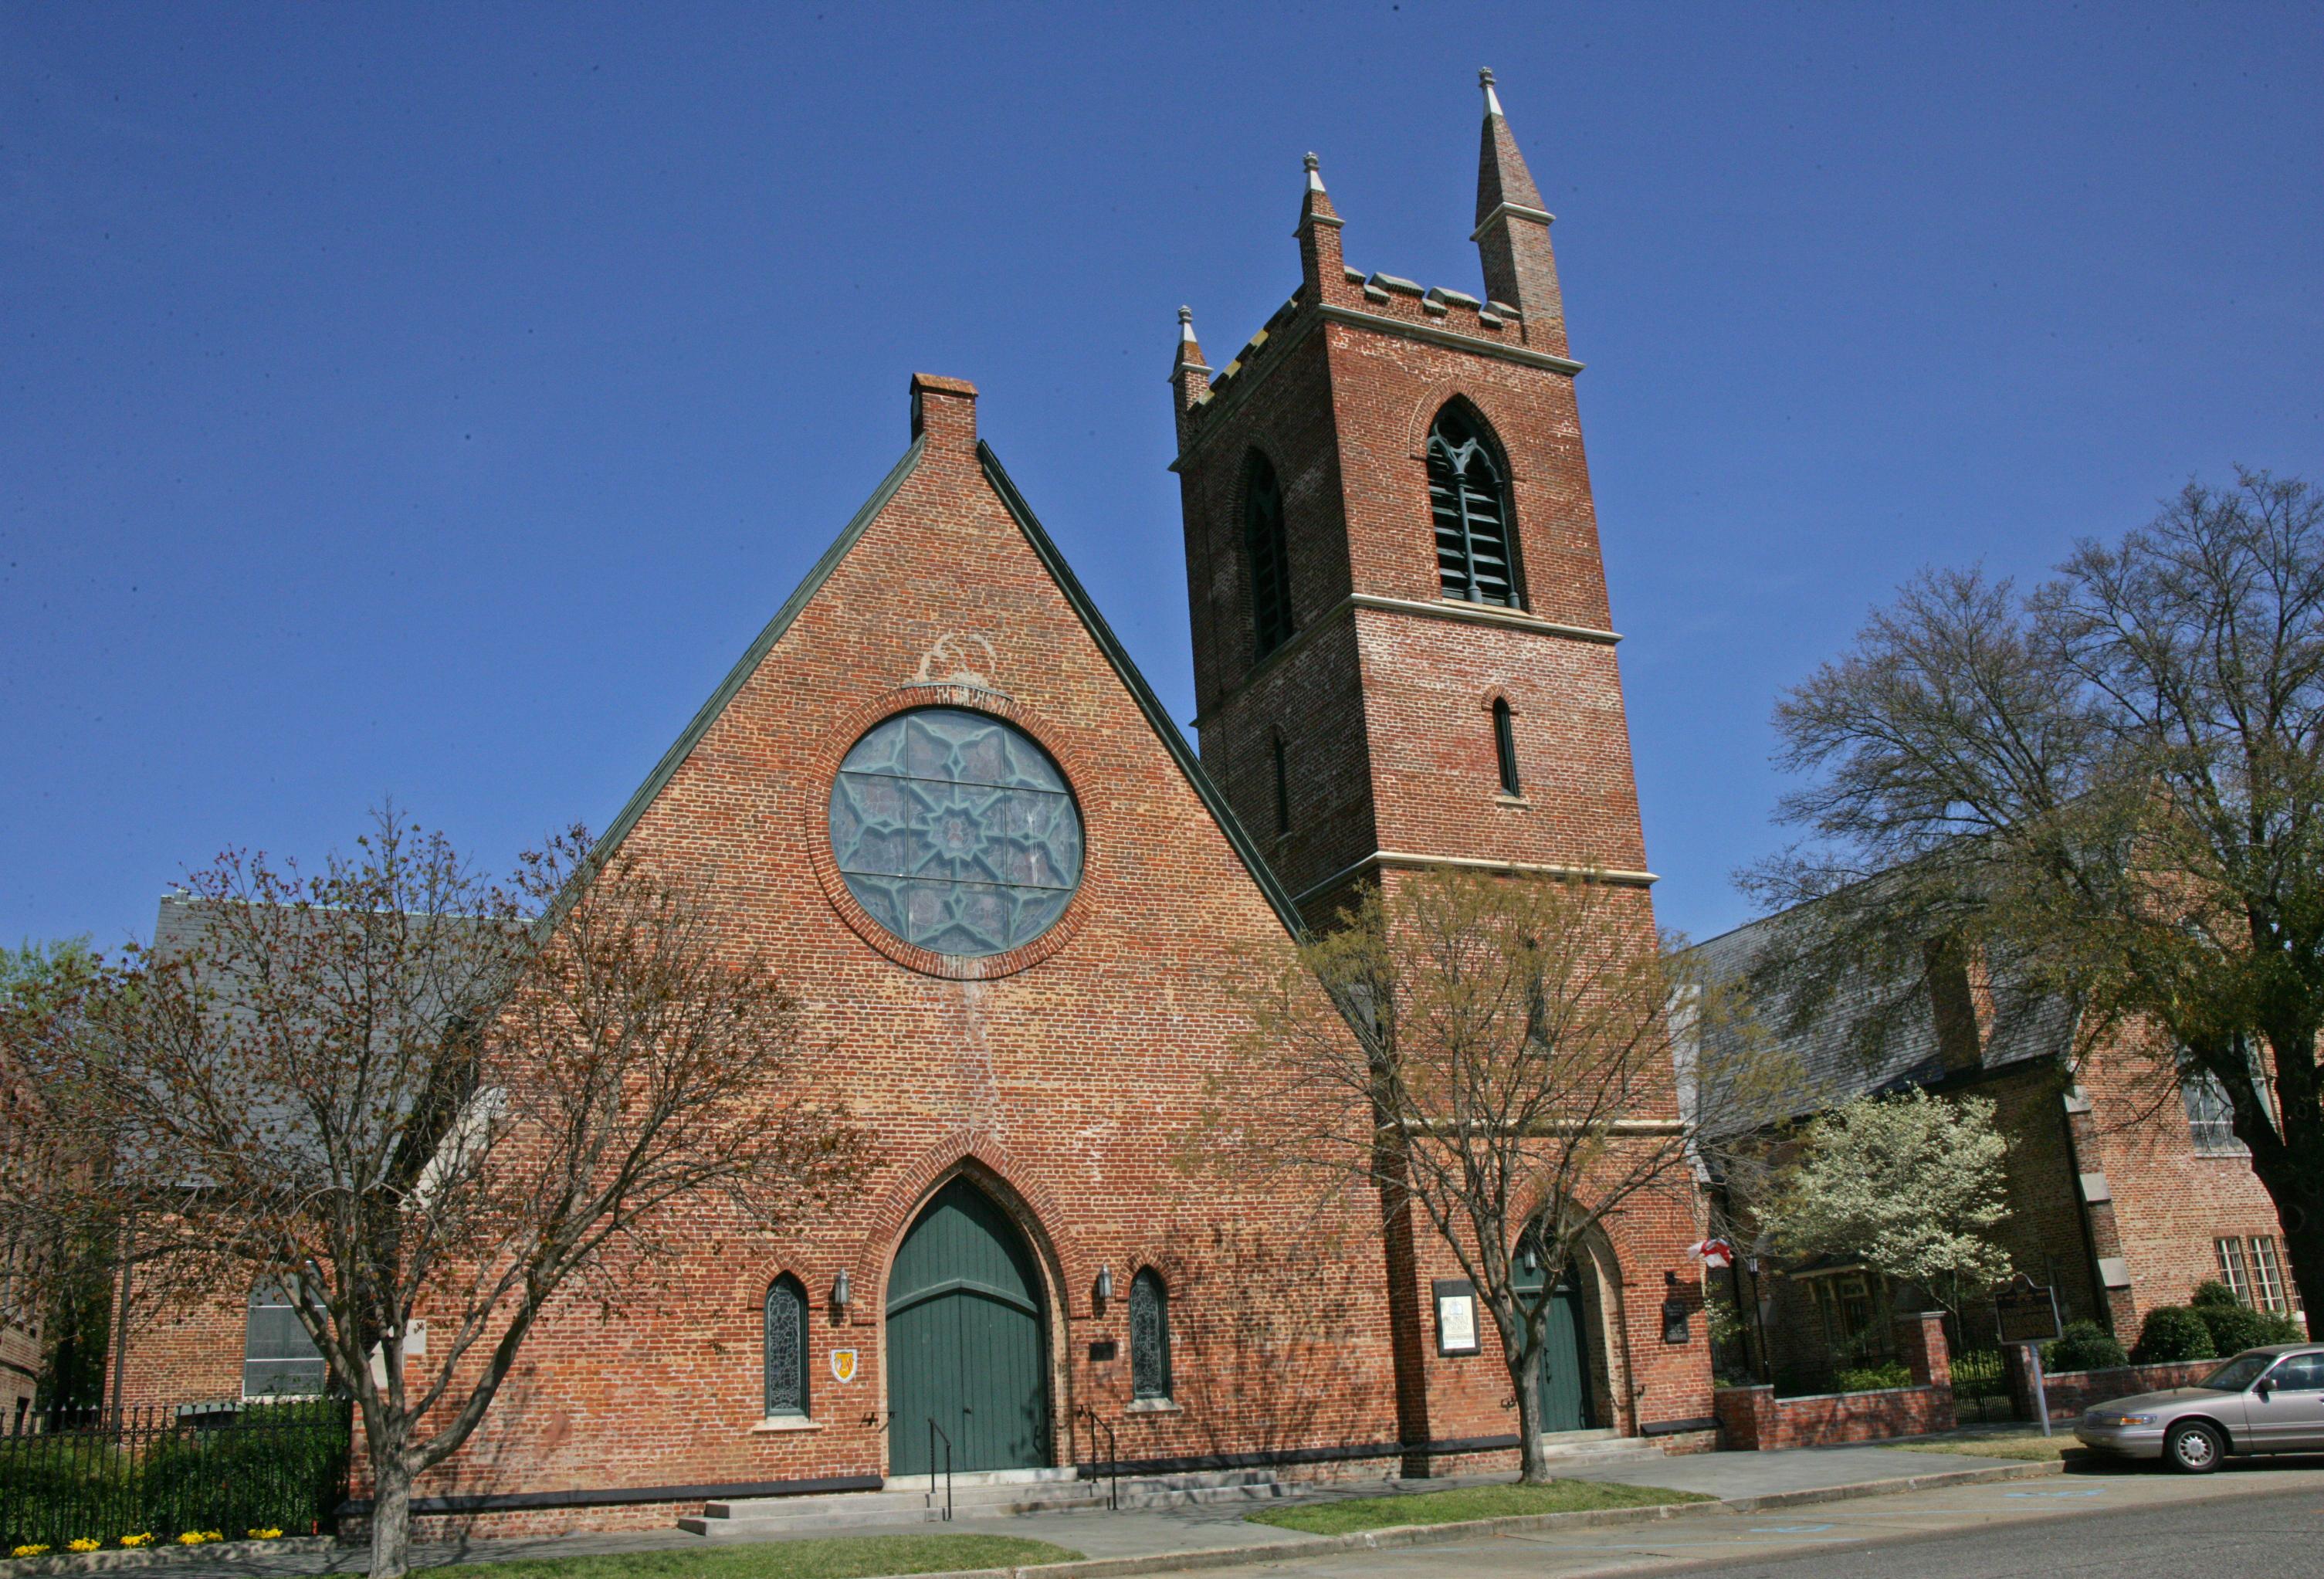 selma alabama st paul s episcopal church burned following the battle of selma and rebuilt in 1871